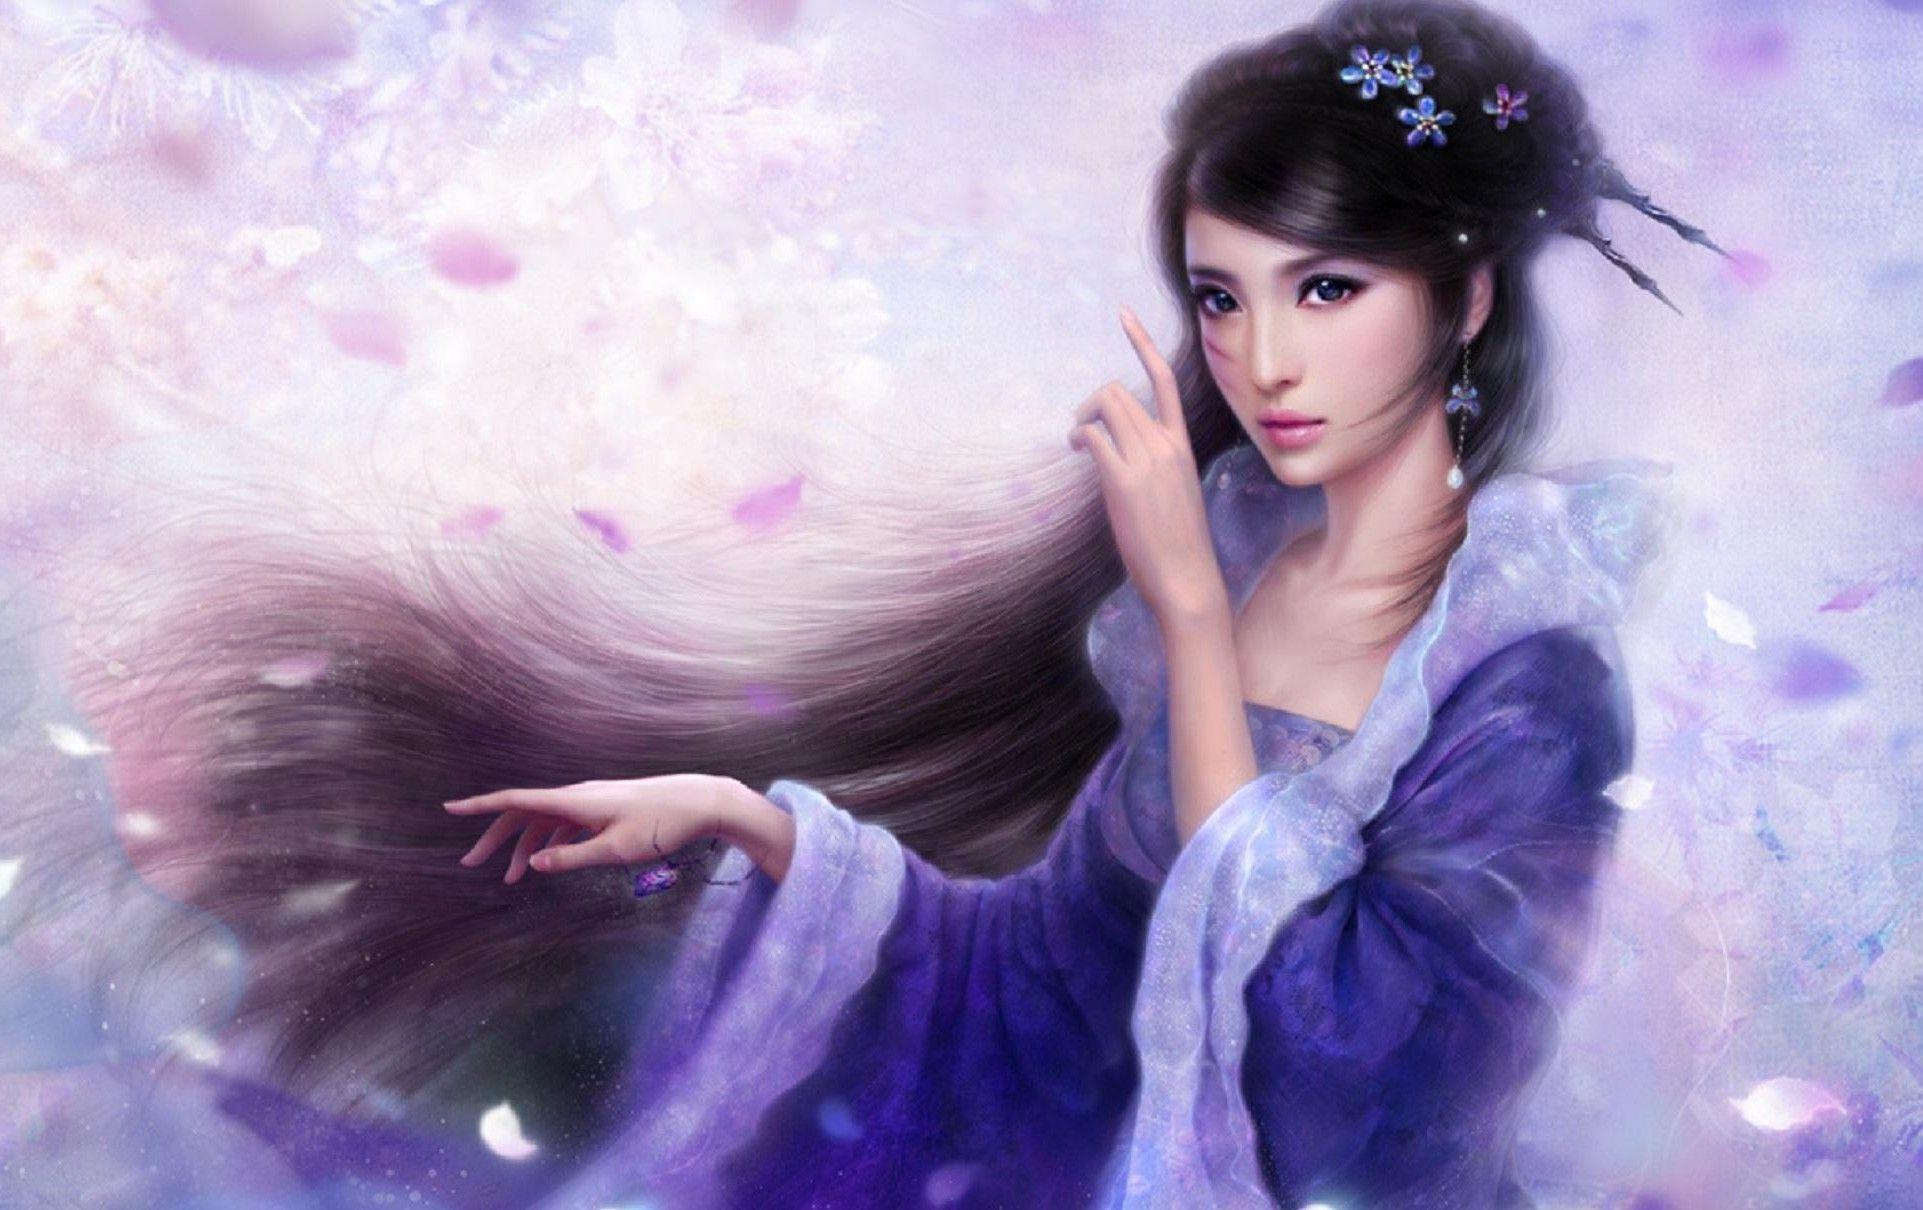 Chinese Beautiful Girl Wallpaper Awesome Fantasy Princess Wallpapers Wallpaper Cave